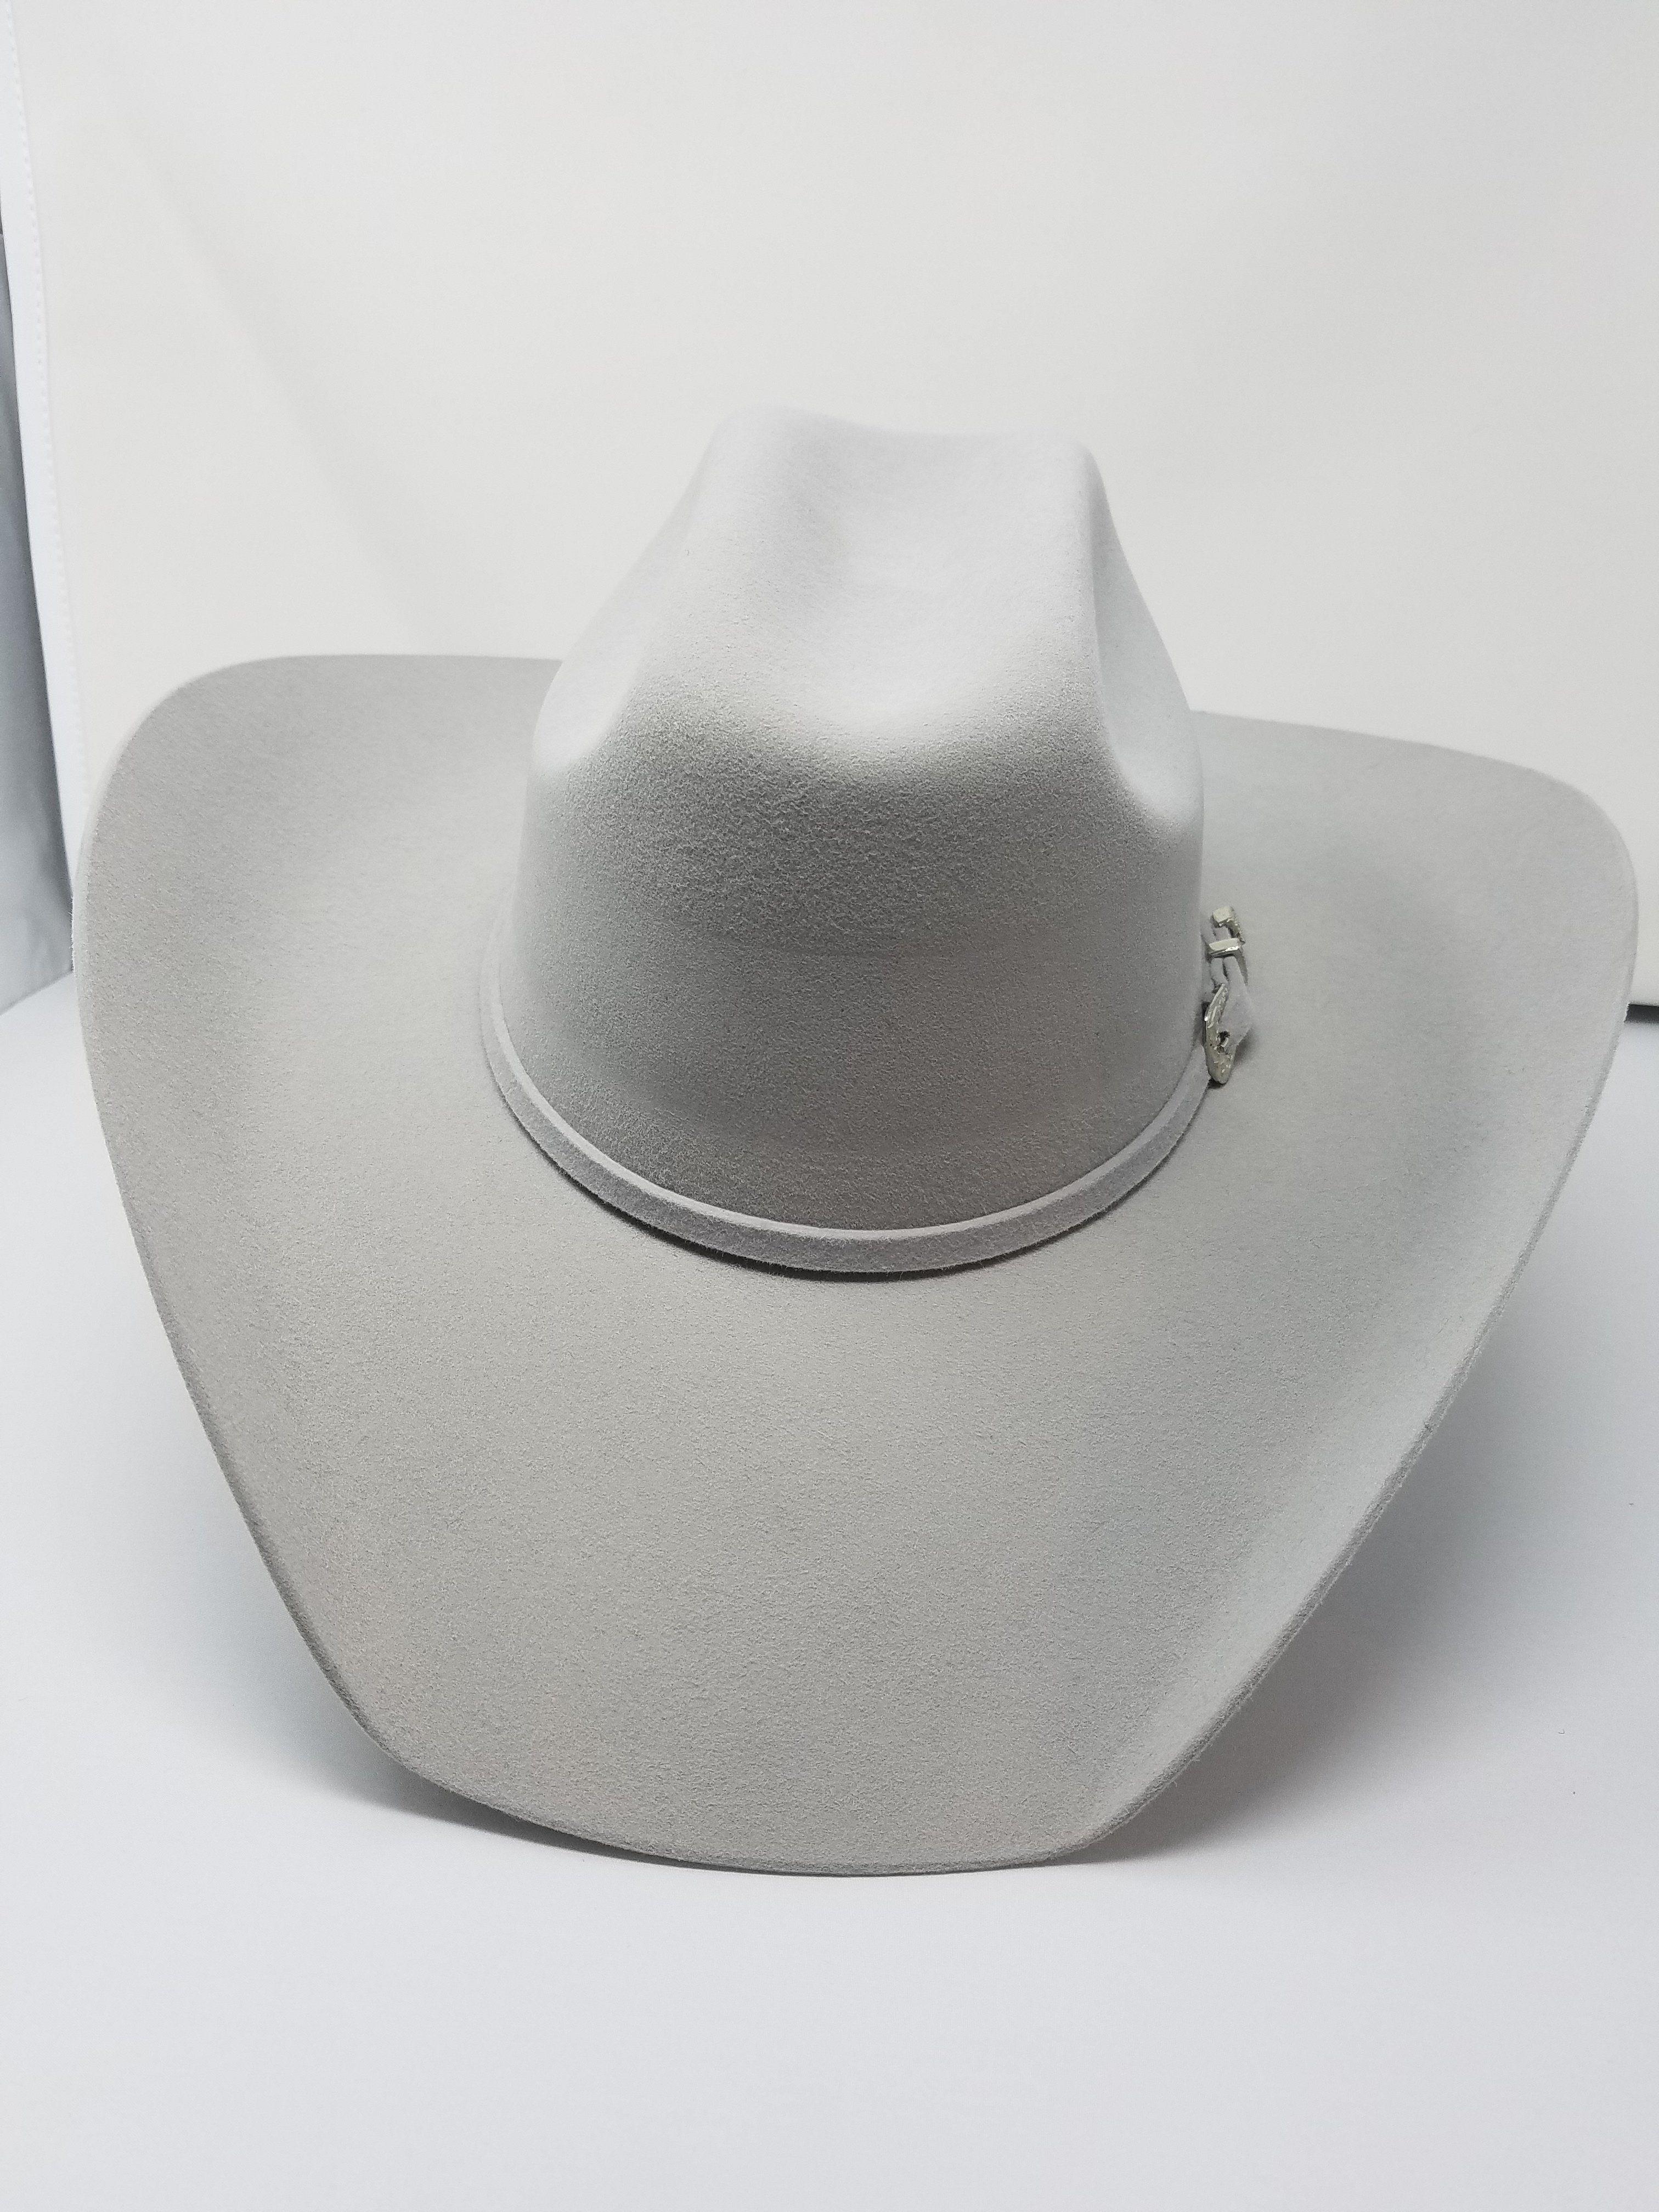 Bullhide Hats BOOT HILL 8X Fur Blend Felt Cowboy Hat Black